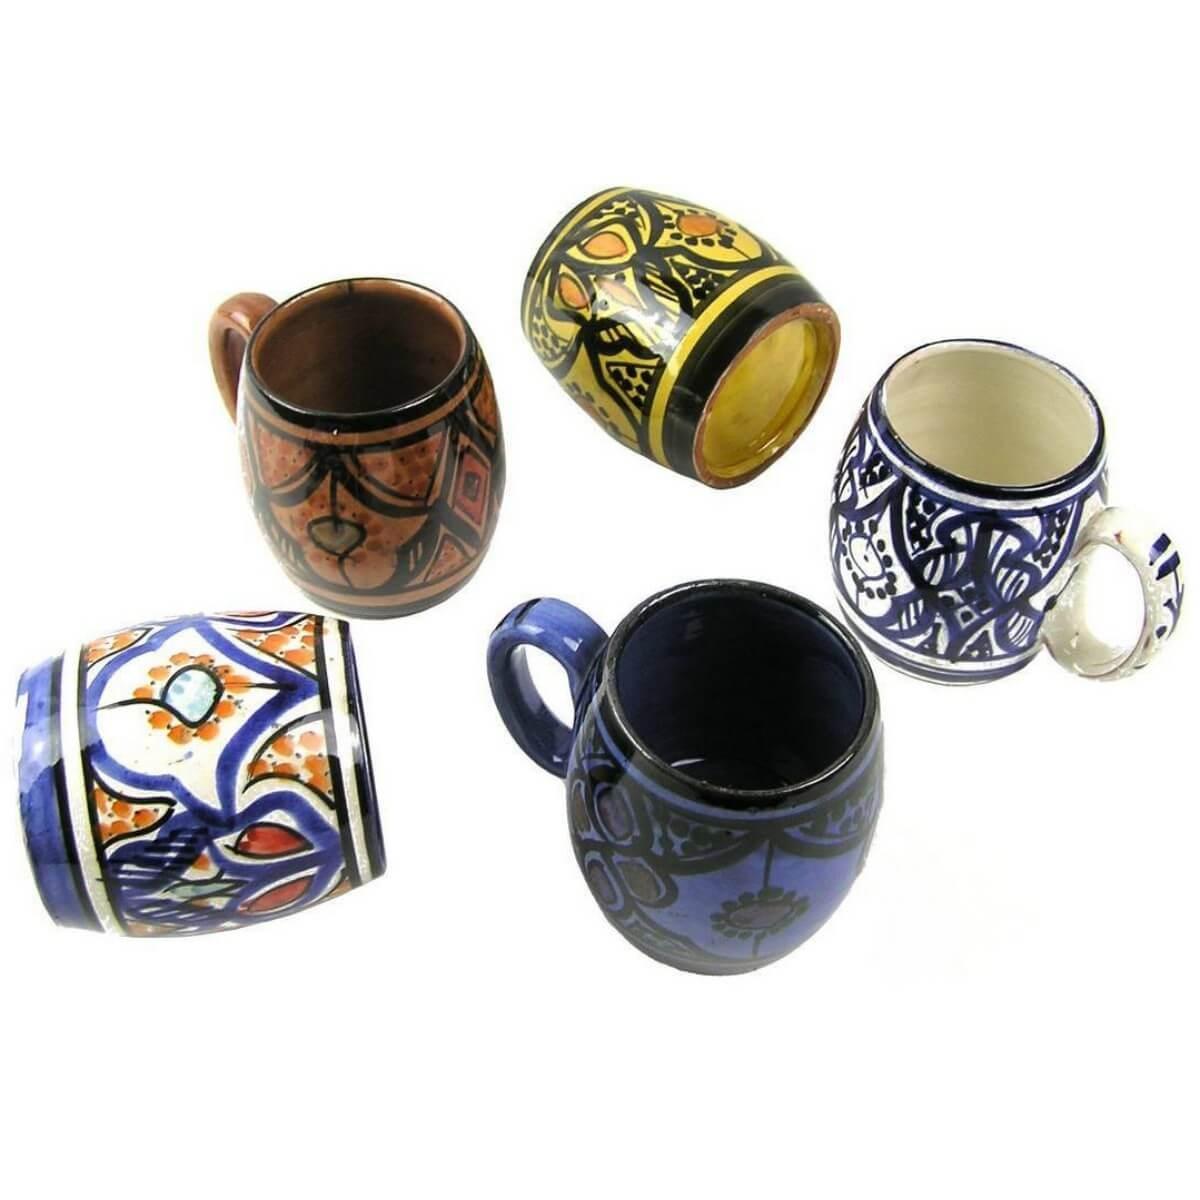 becher keramik tasse marokkanische bemalung accessoires